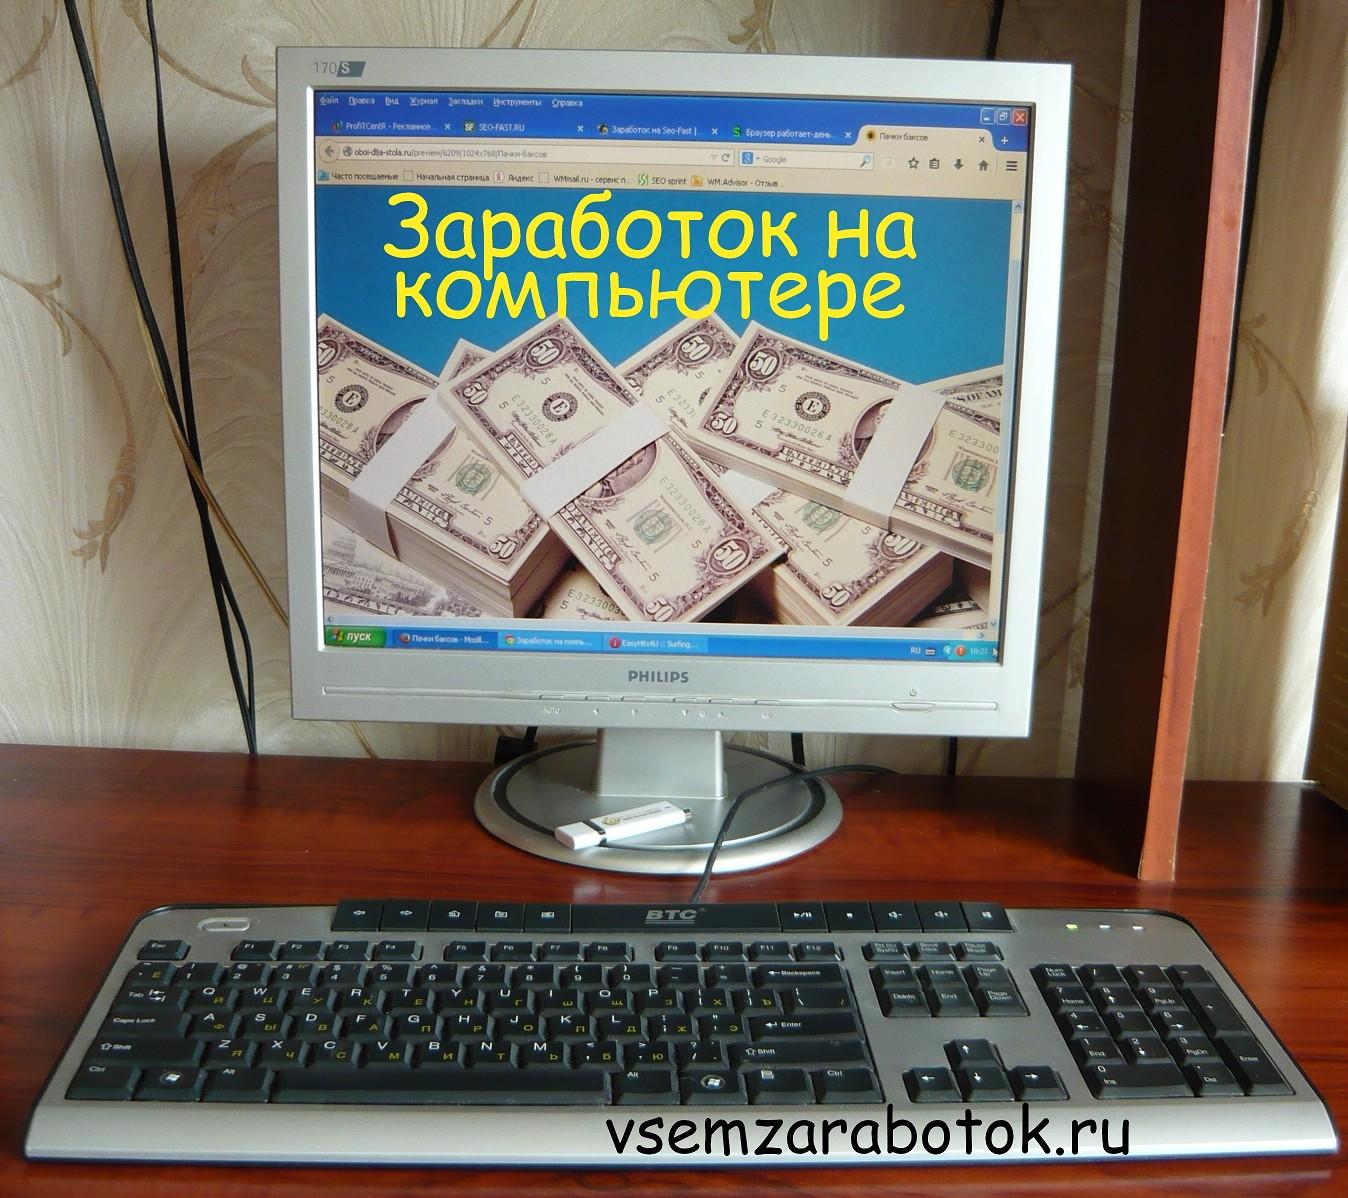 Заработок на компьютере